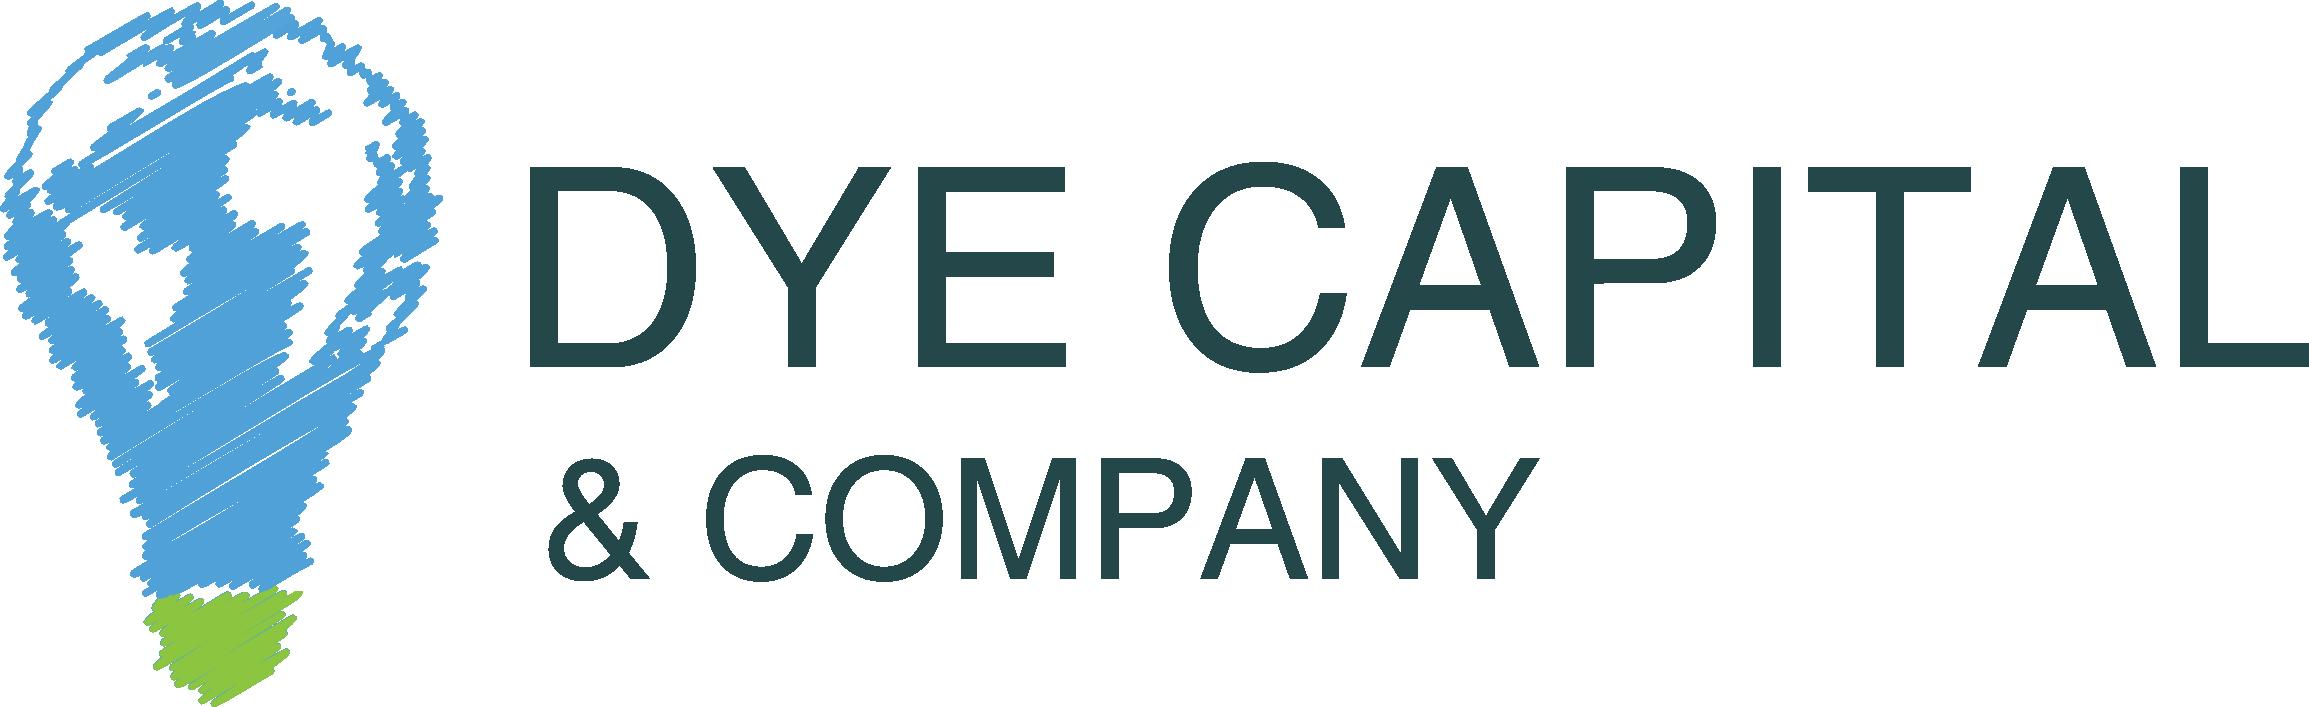 Dye Capital and Company